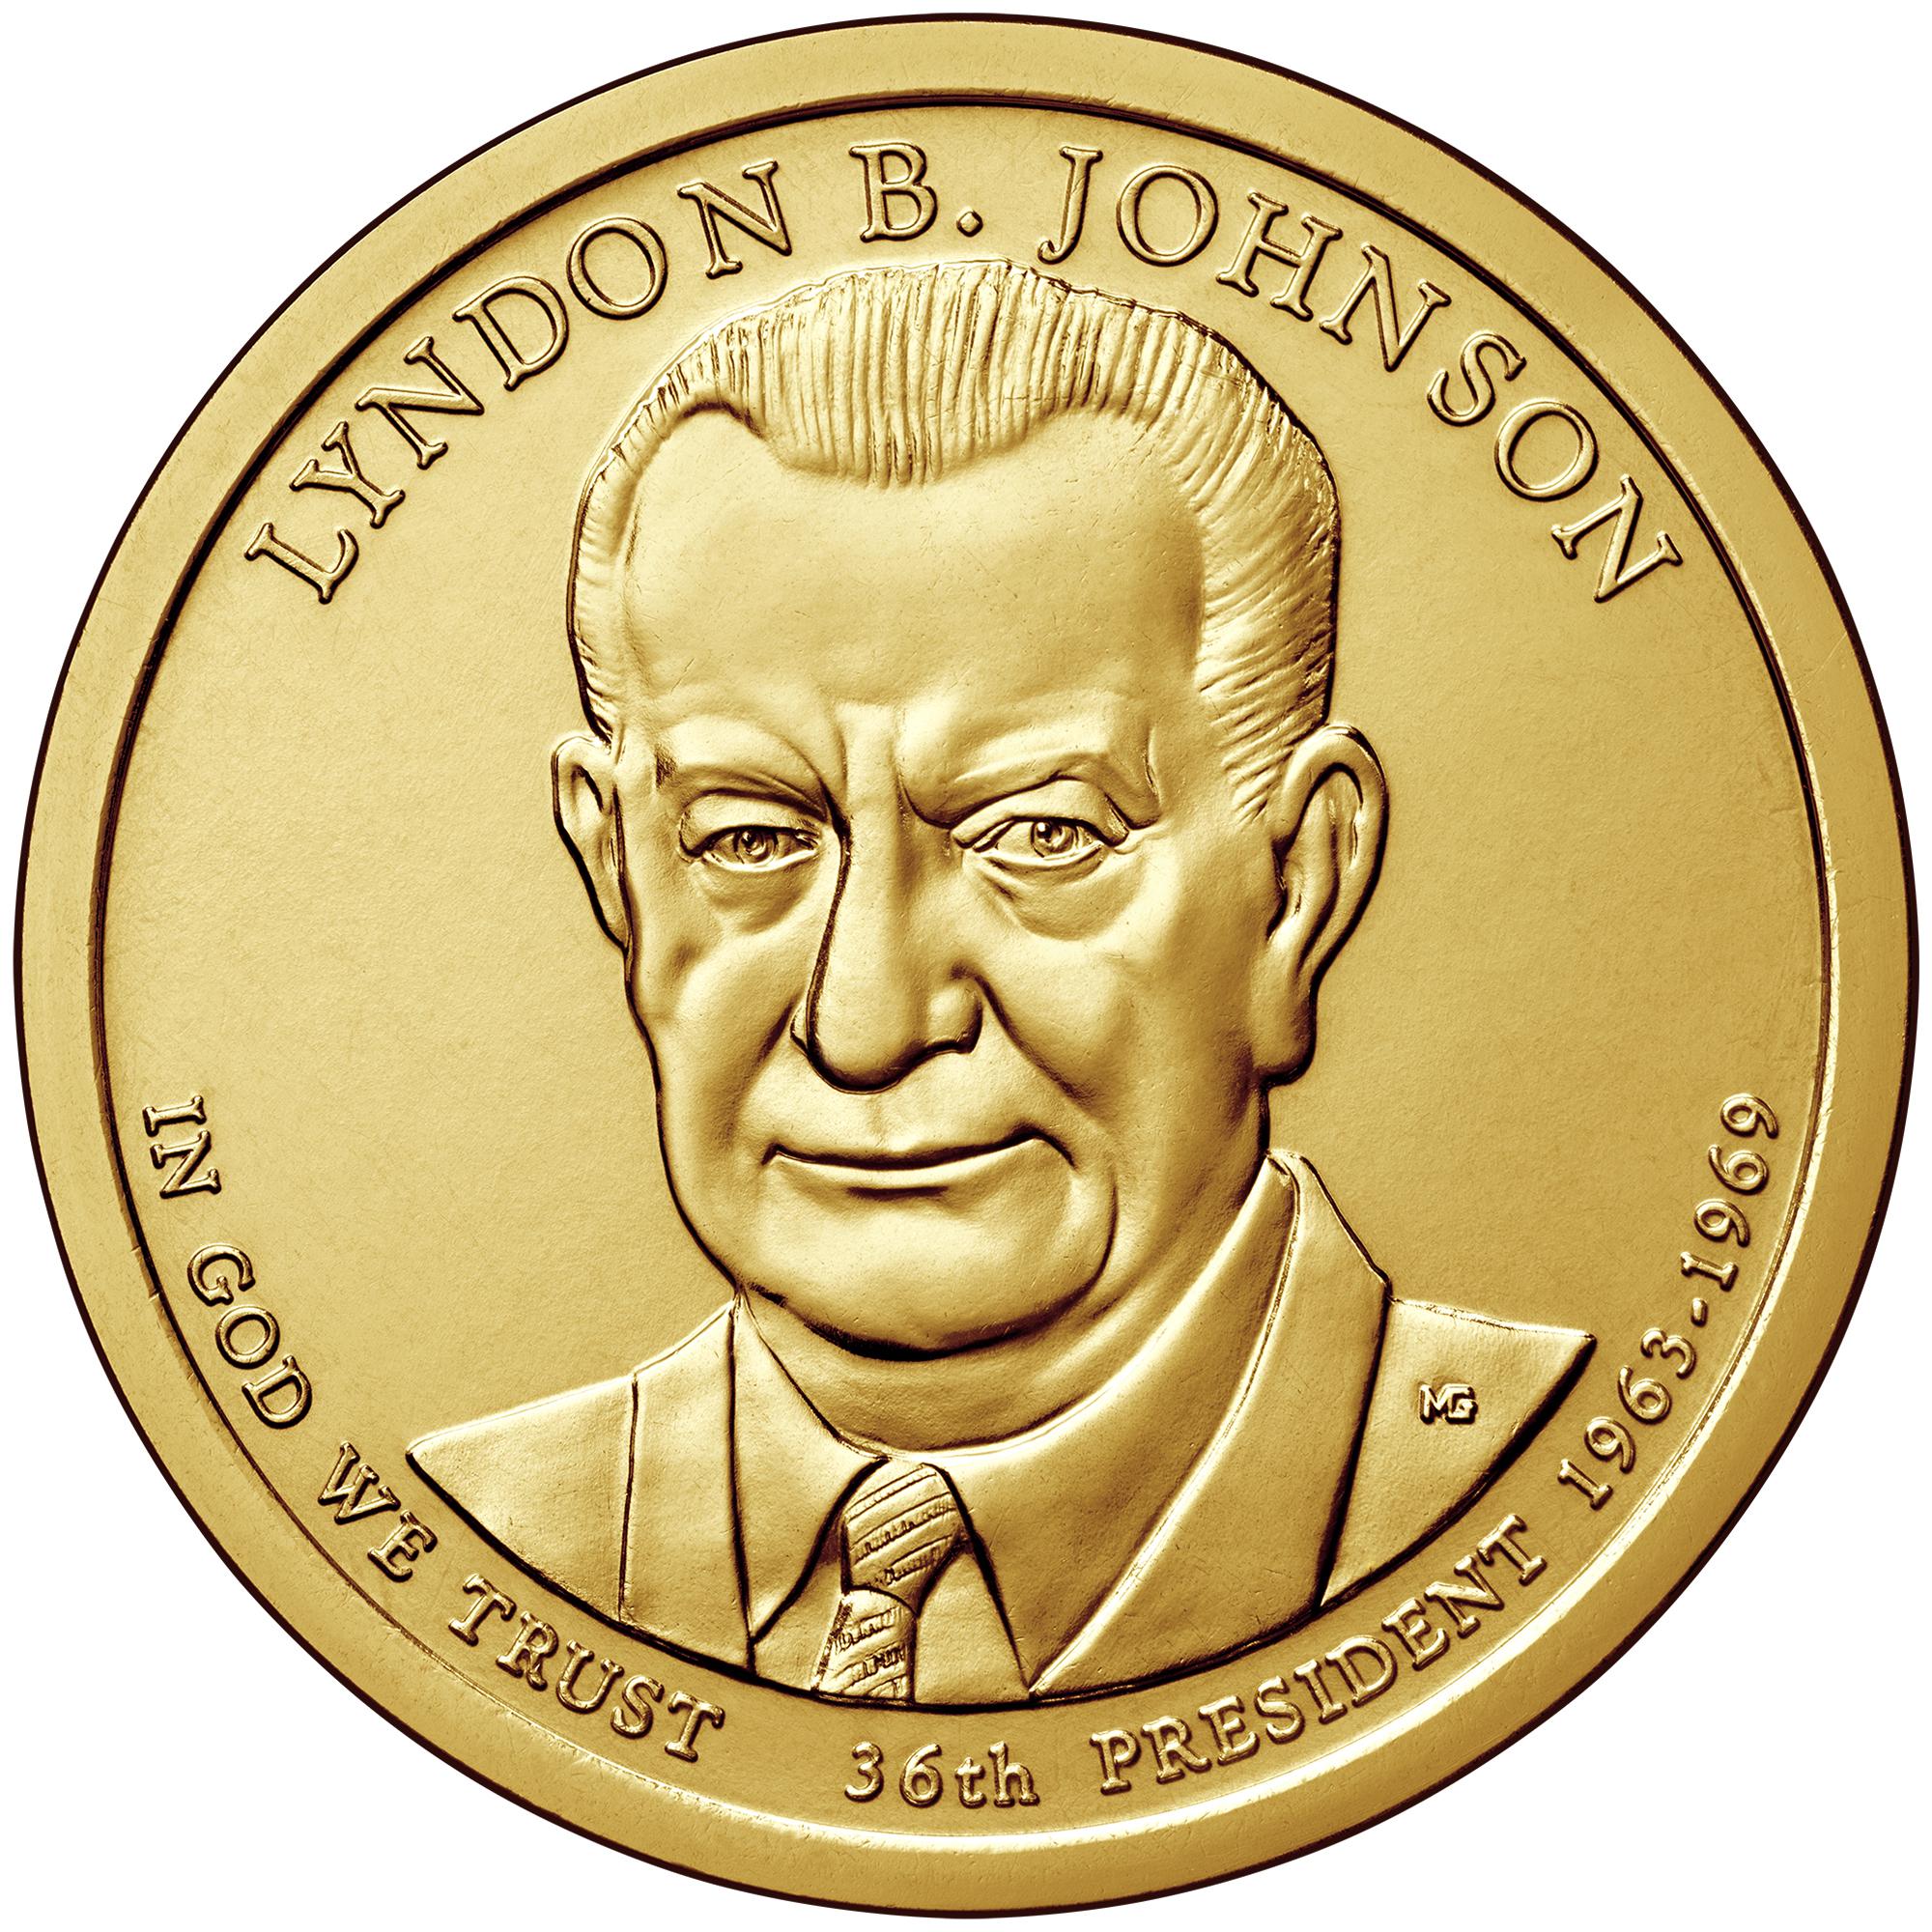 2015 Presidential Dollar Coin Lyndon B. Johnson Uncirculated Obverse